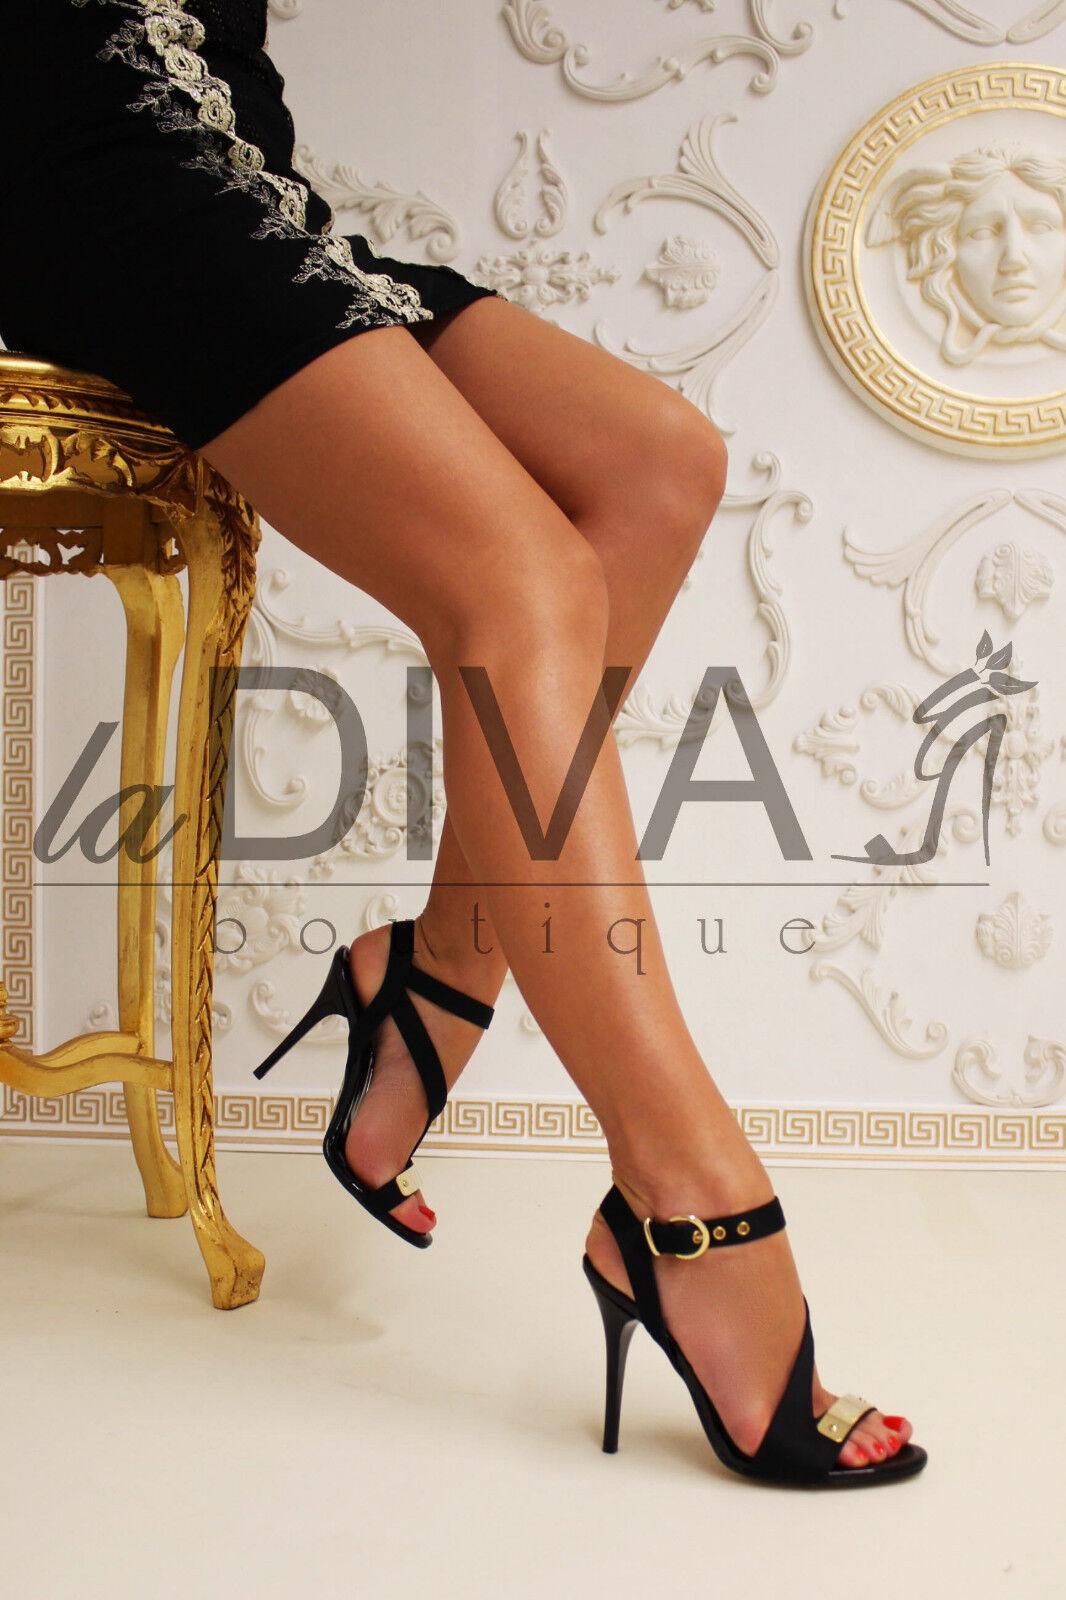 NILA & satin NILA ~ italy sandali satin & pelle pannello in metallo 39 Nero Oro Tacchi e05035